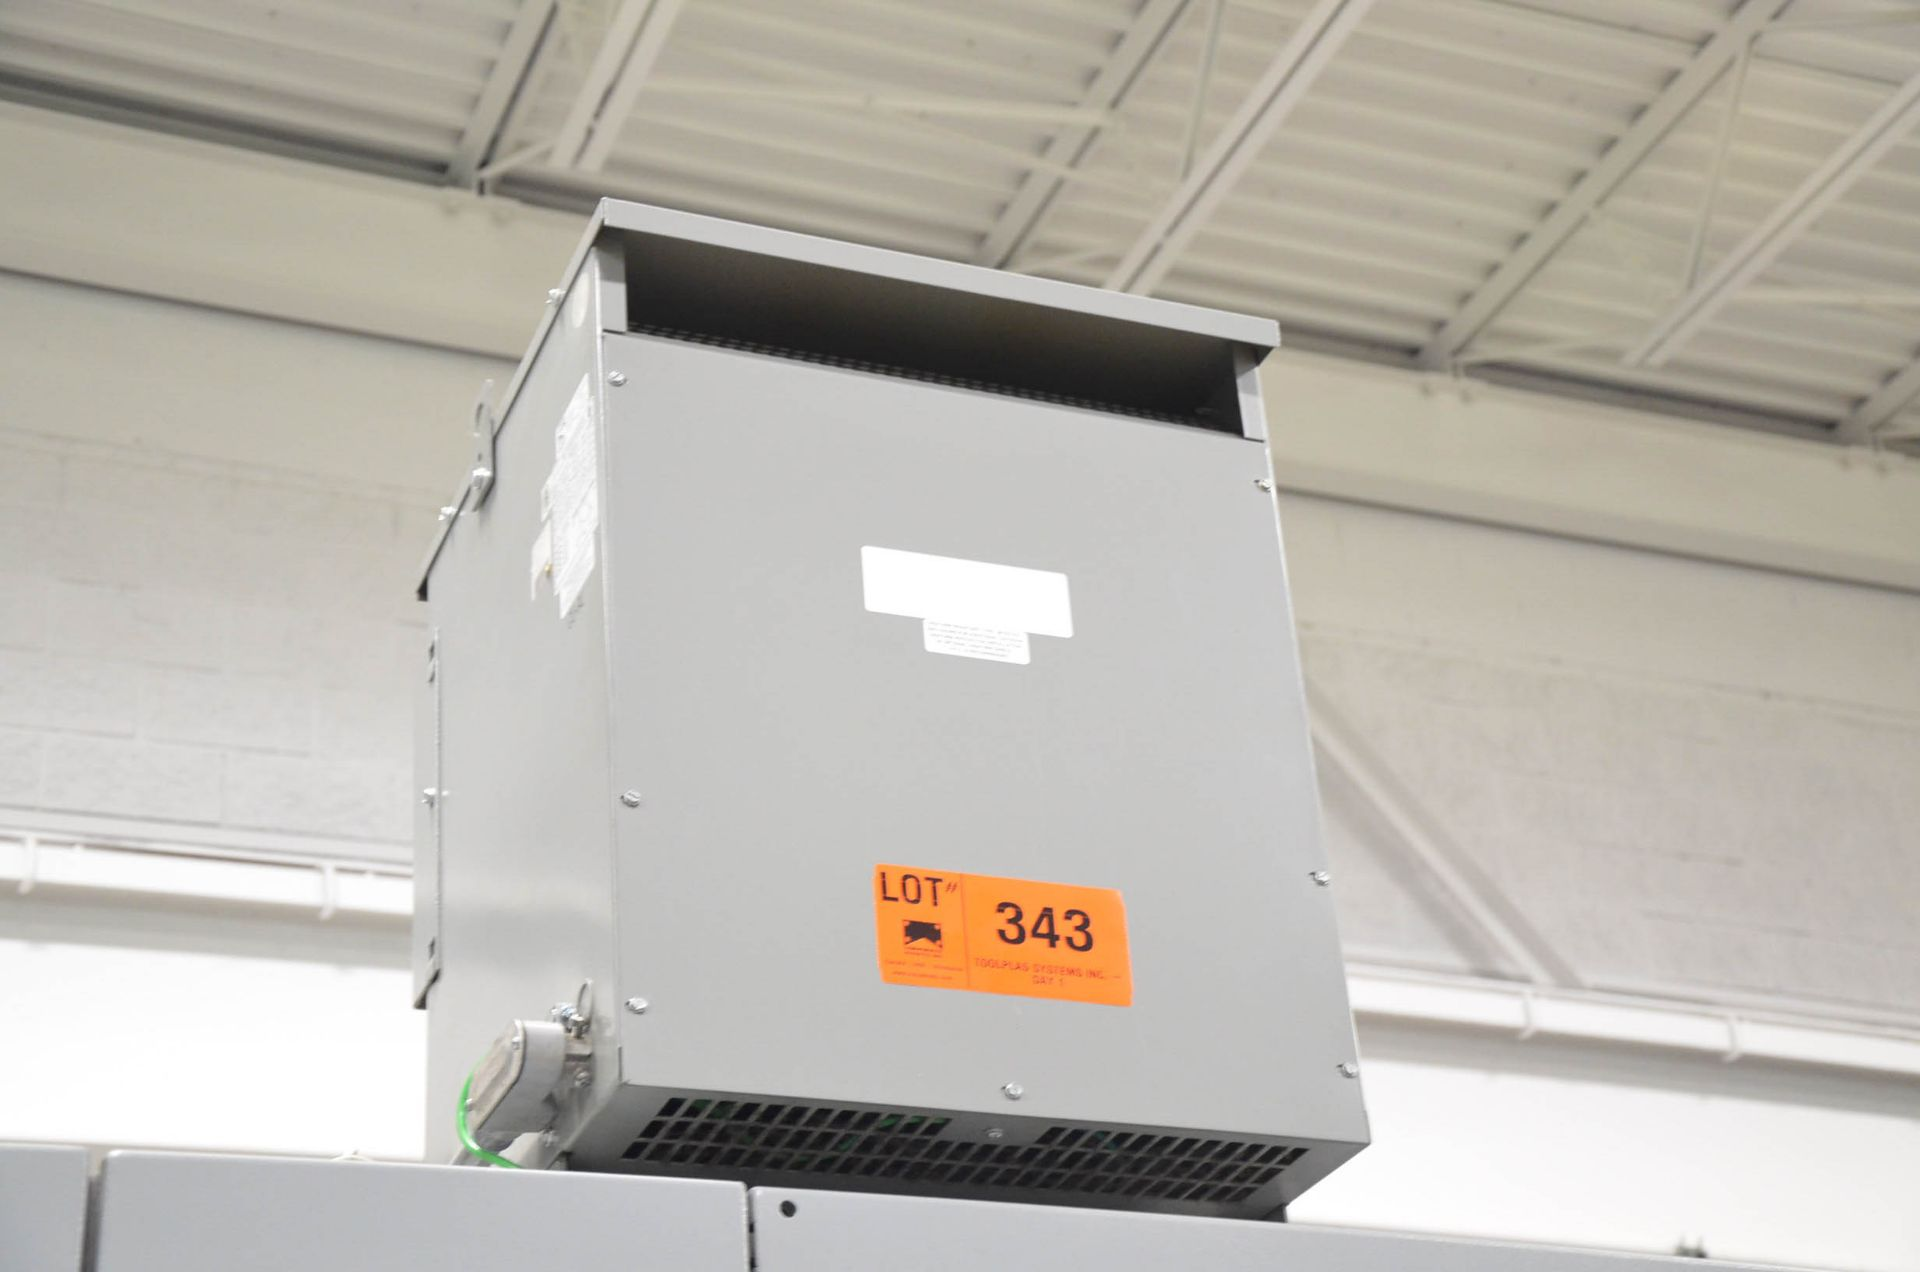 REX 45KVA/600-400-221V/3PH/60HZ TRANSFORMER (CI) [RIGGING FEES FOR LOT #343 - $50 USD PLUS